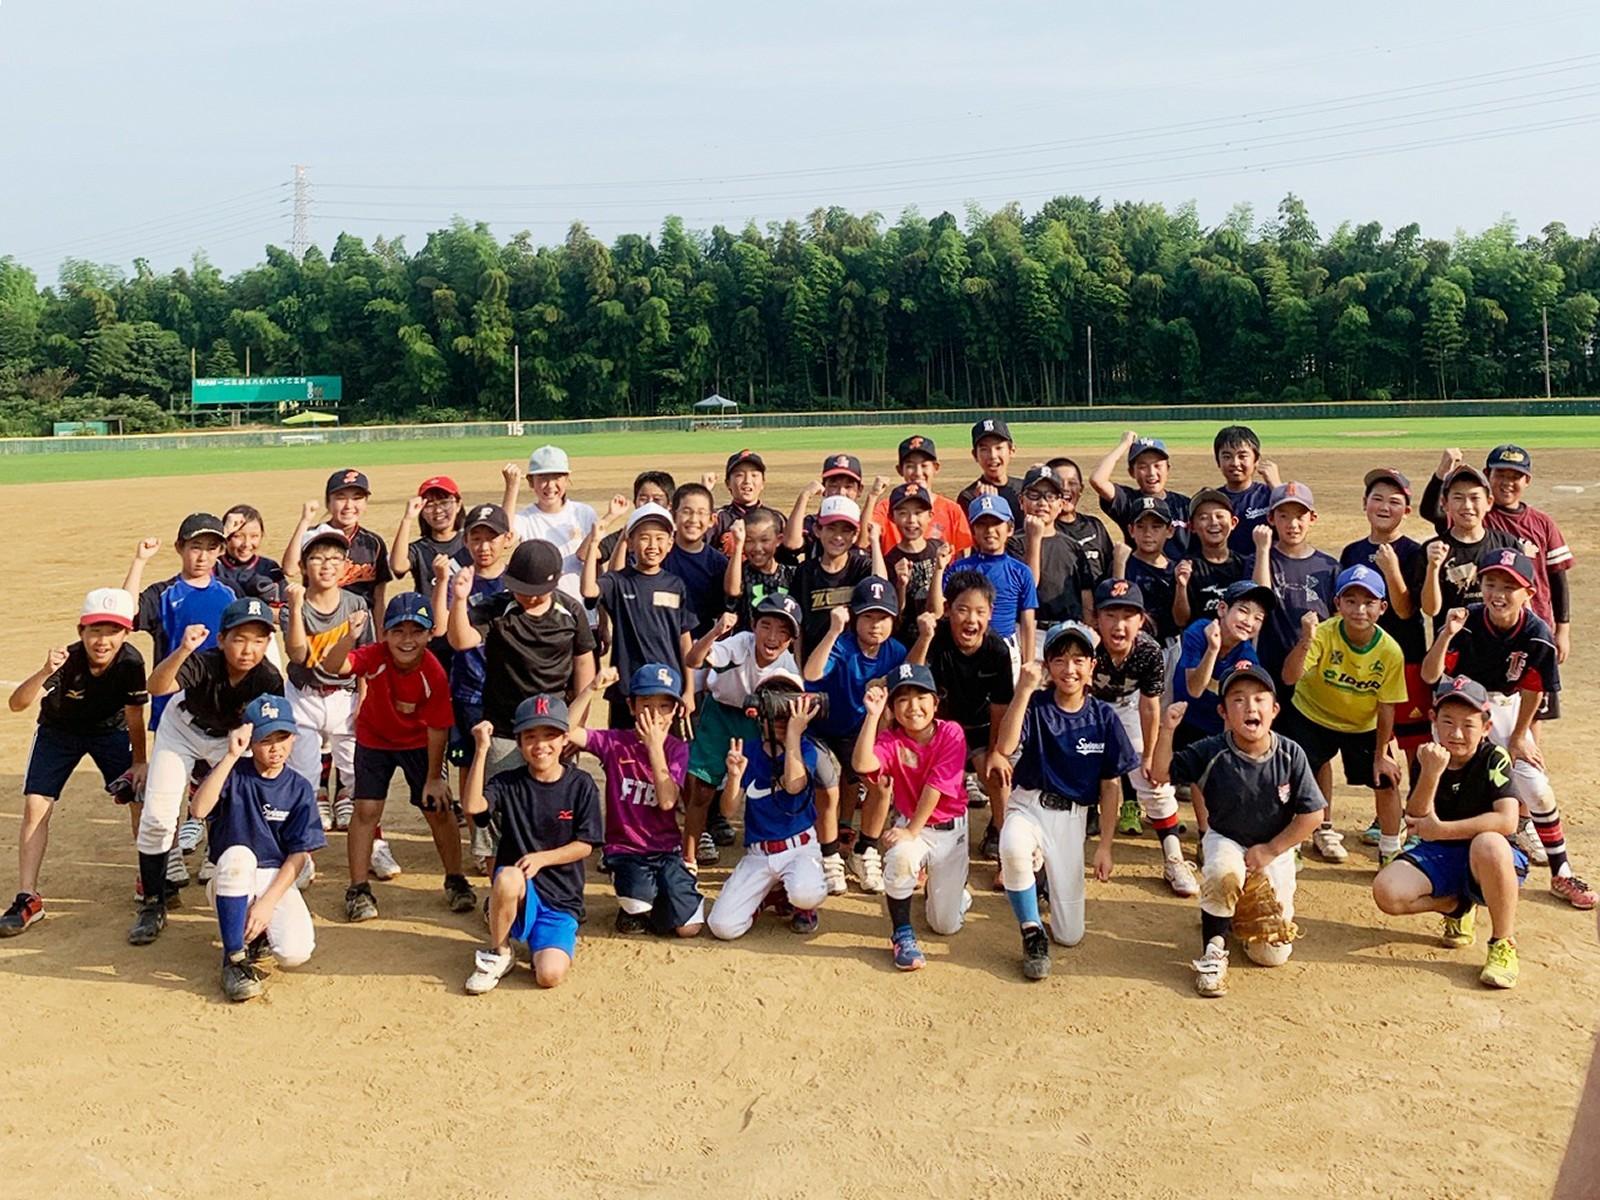 2019.07.30 夏休み野球教室交流試合2019 05